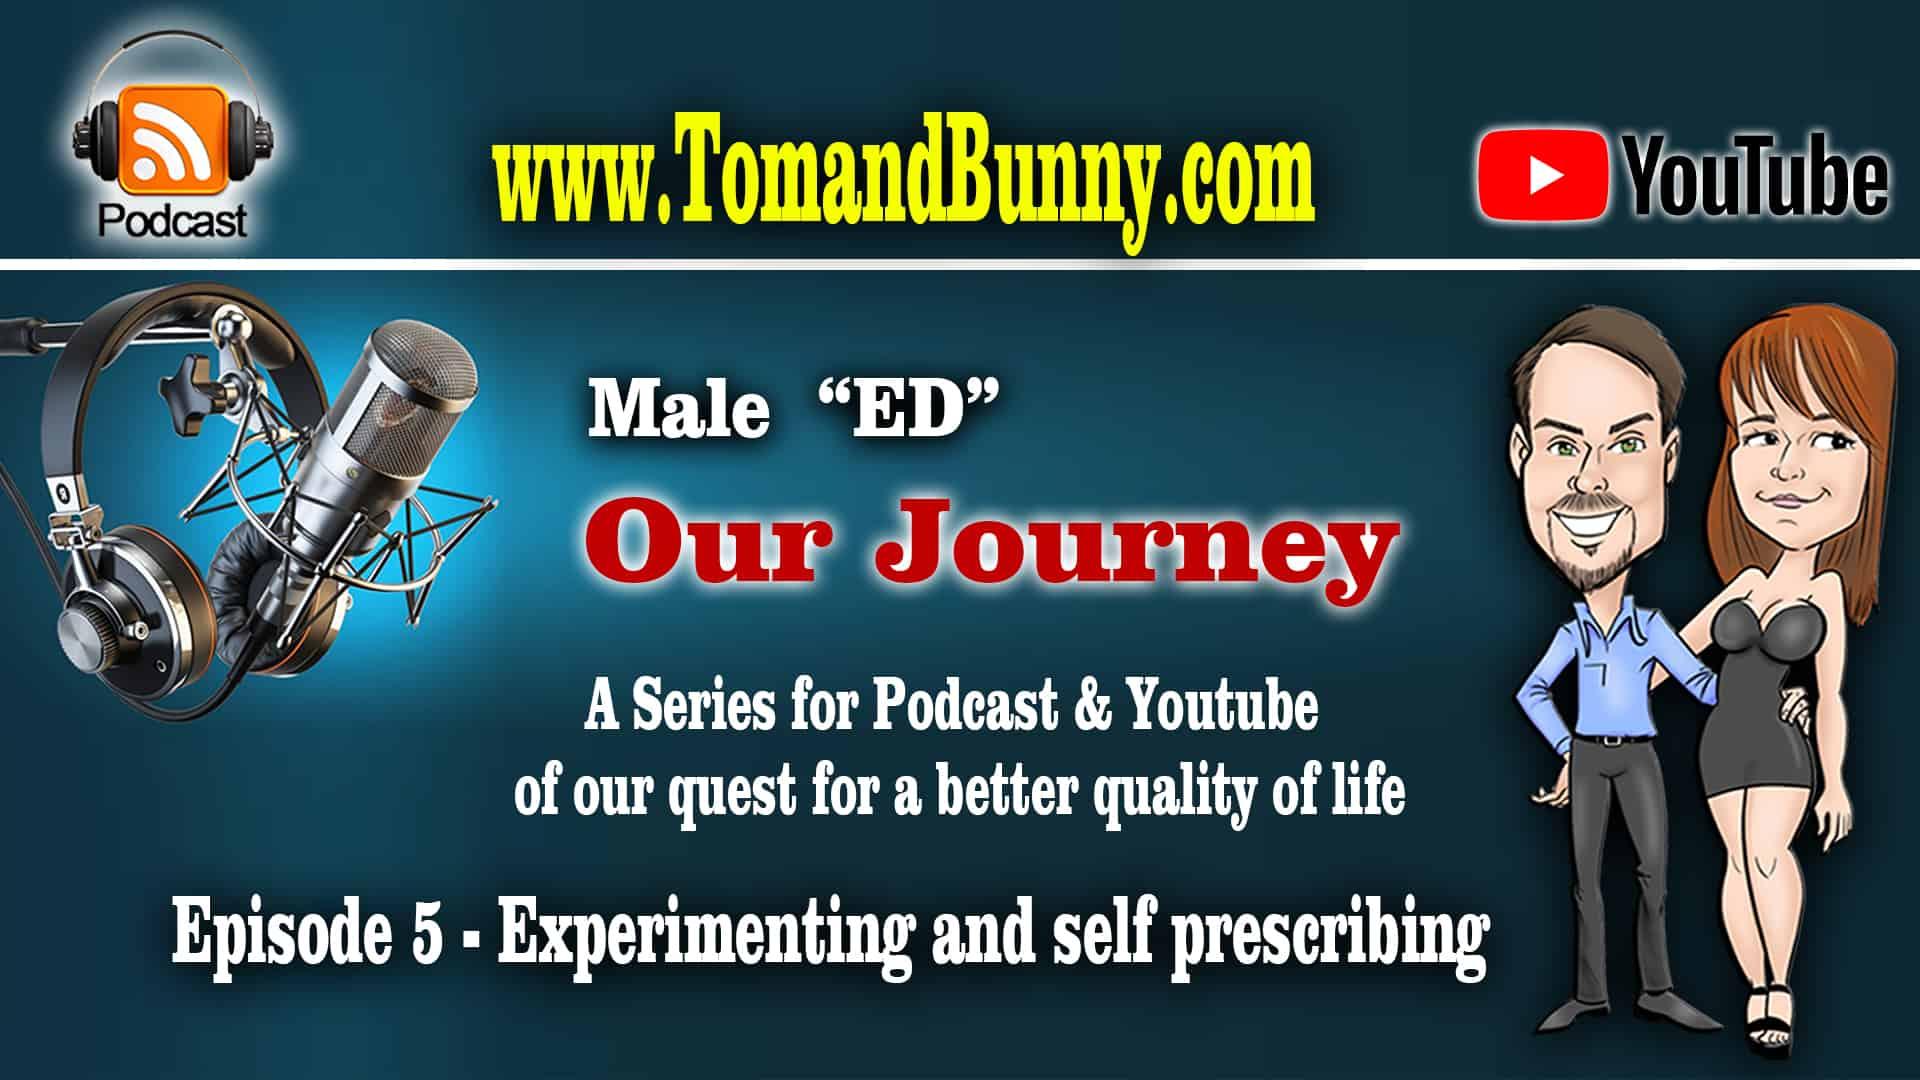 Episode 5 - Experimenting and self prescribing